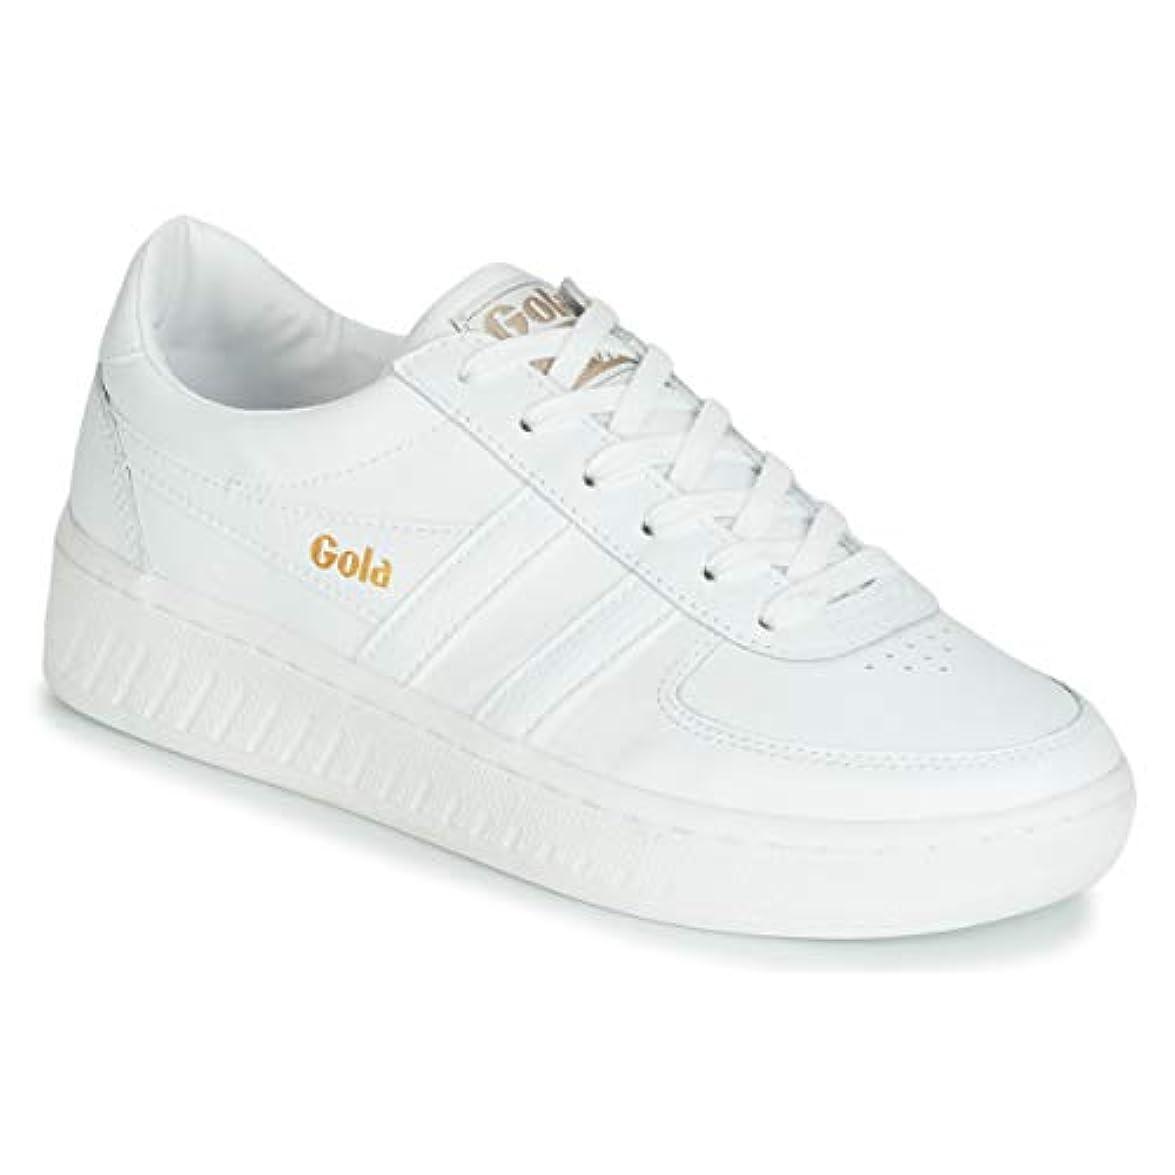 Gola Cla567 Sneaker Donna